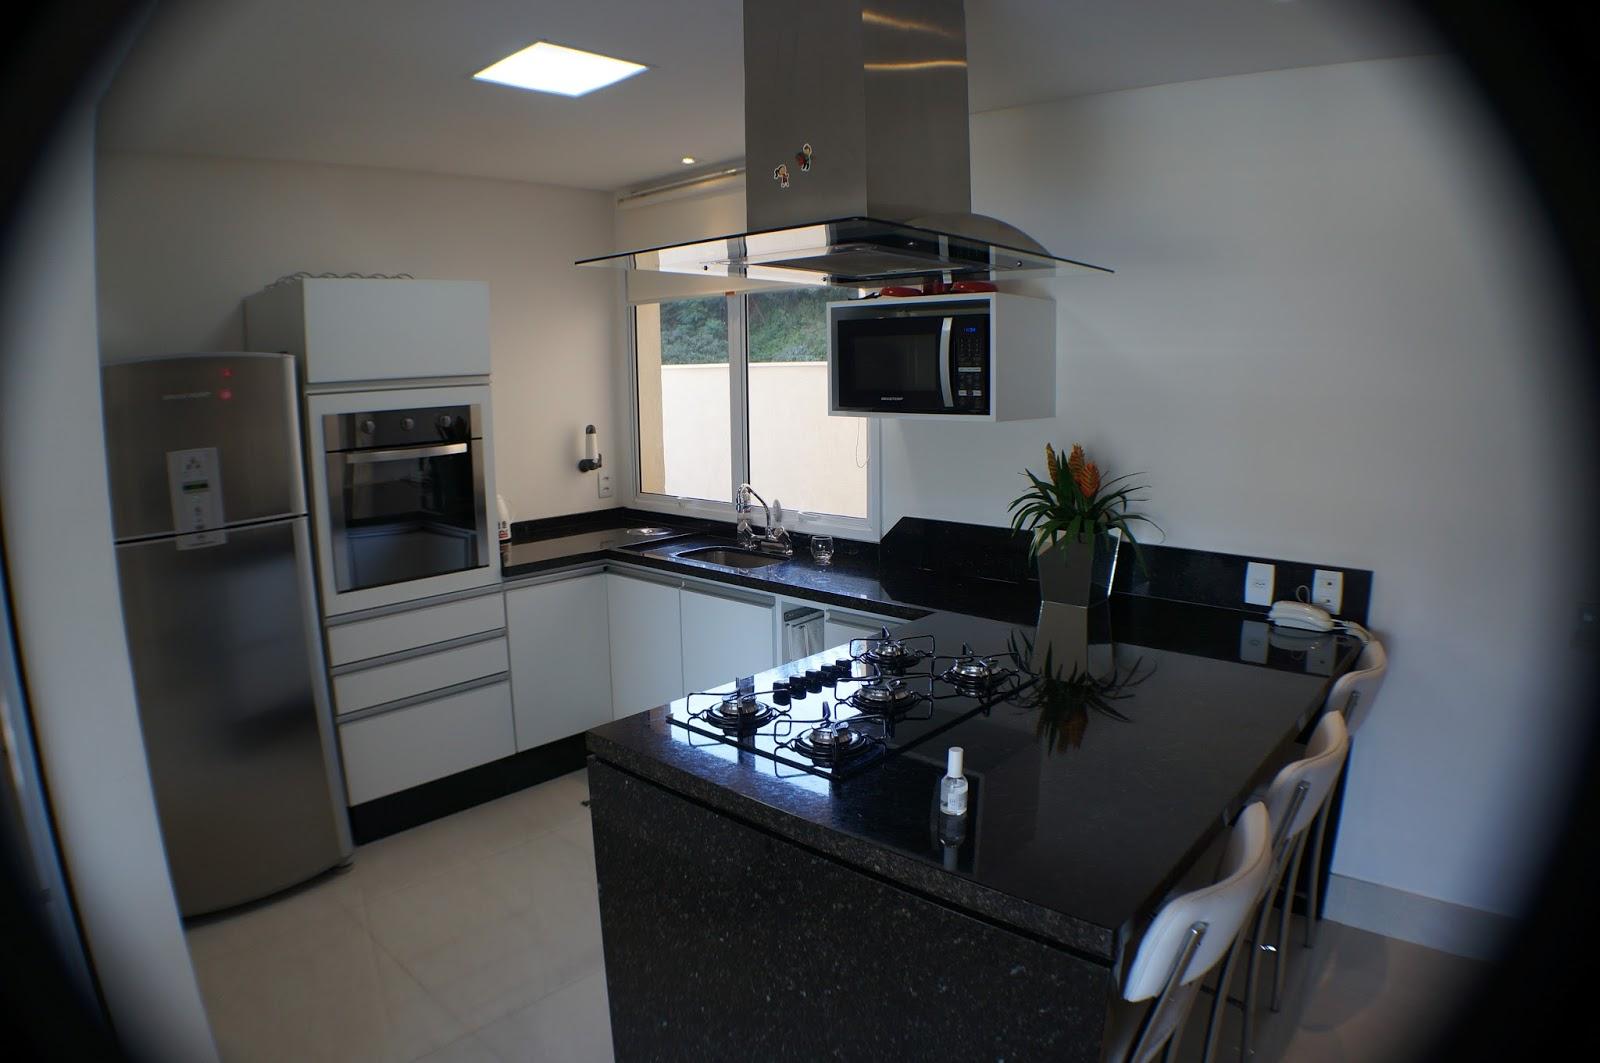 Armario De Cozinha Para Cooktop E Forno Cozinha Compacta Areos